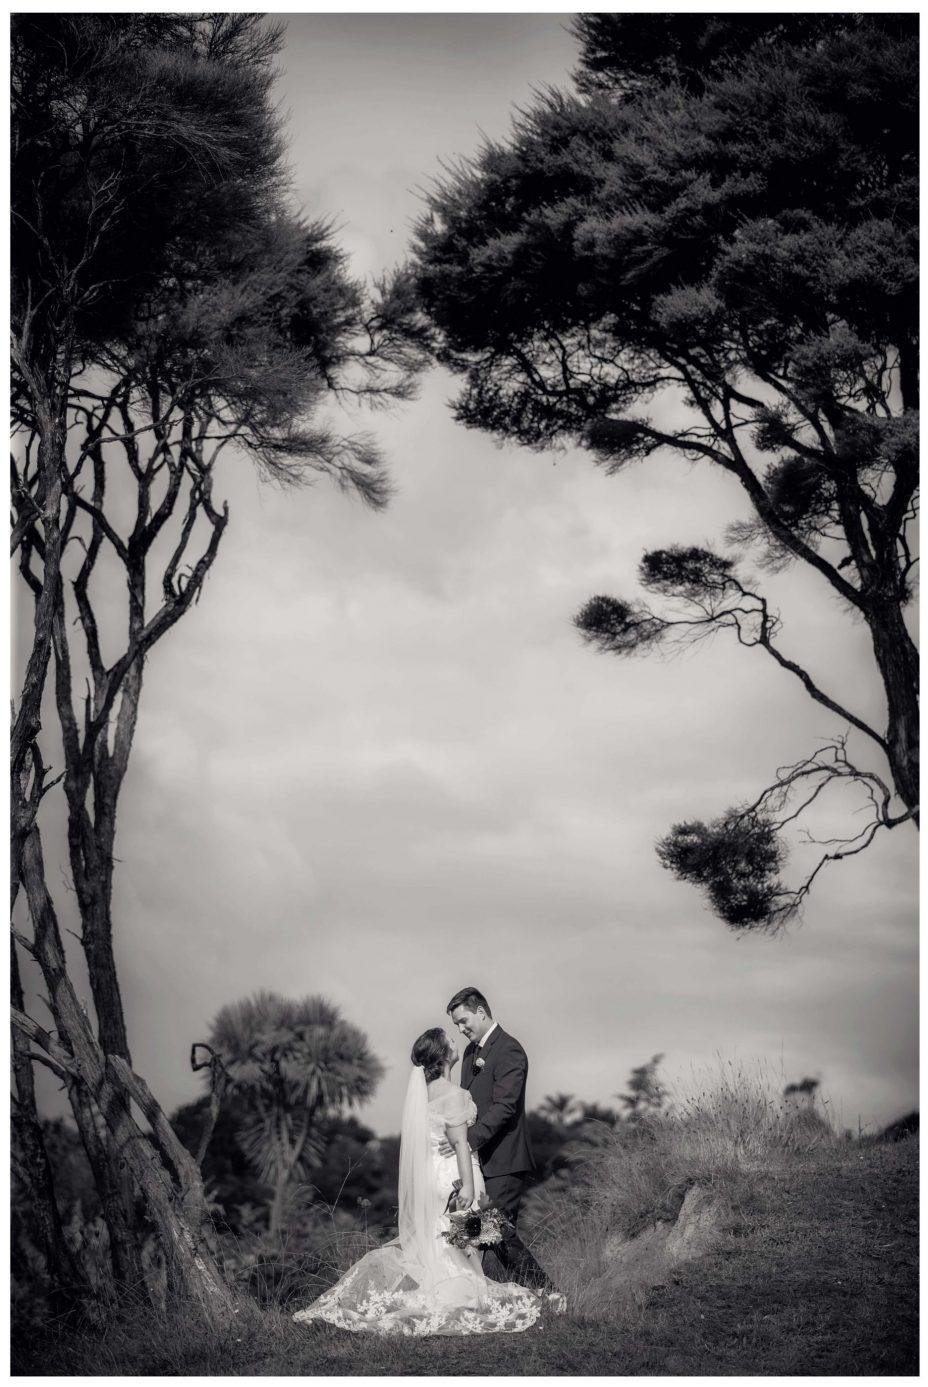 Creative wedding photo of Bride and groom under Manuka trees in Kumeu